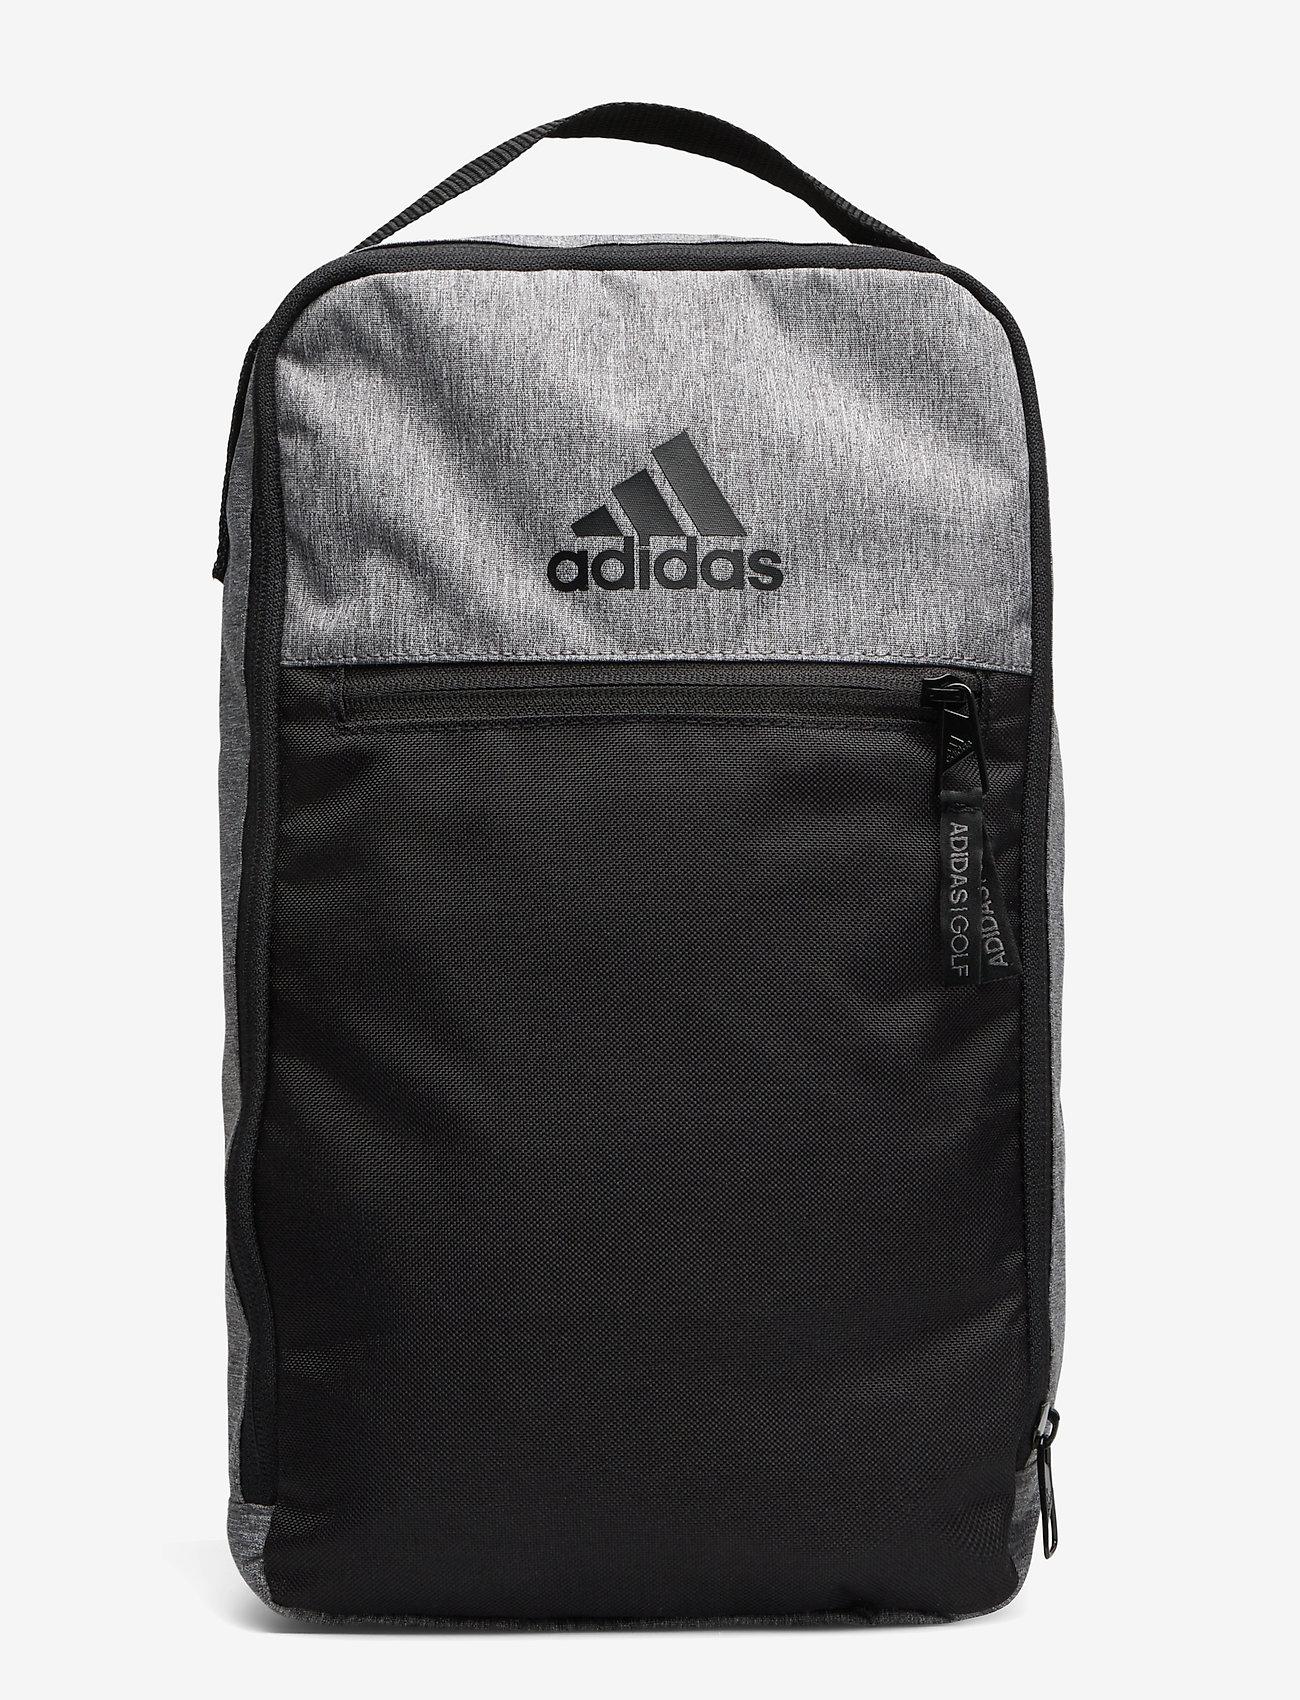 adidas Golf - GOLF SHOE BAG - golfvarusteet - grfime - 0